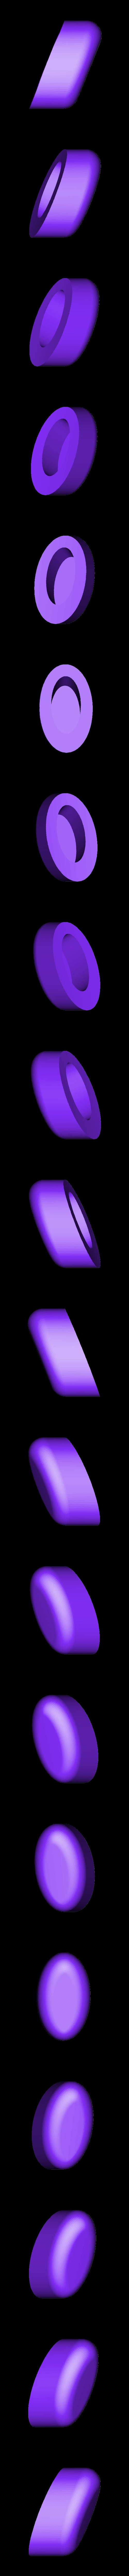 gemstone_x11_v2.stl Download free STL file Simple crown • 3D printable model, poblocki1982